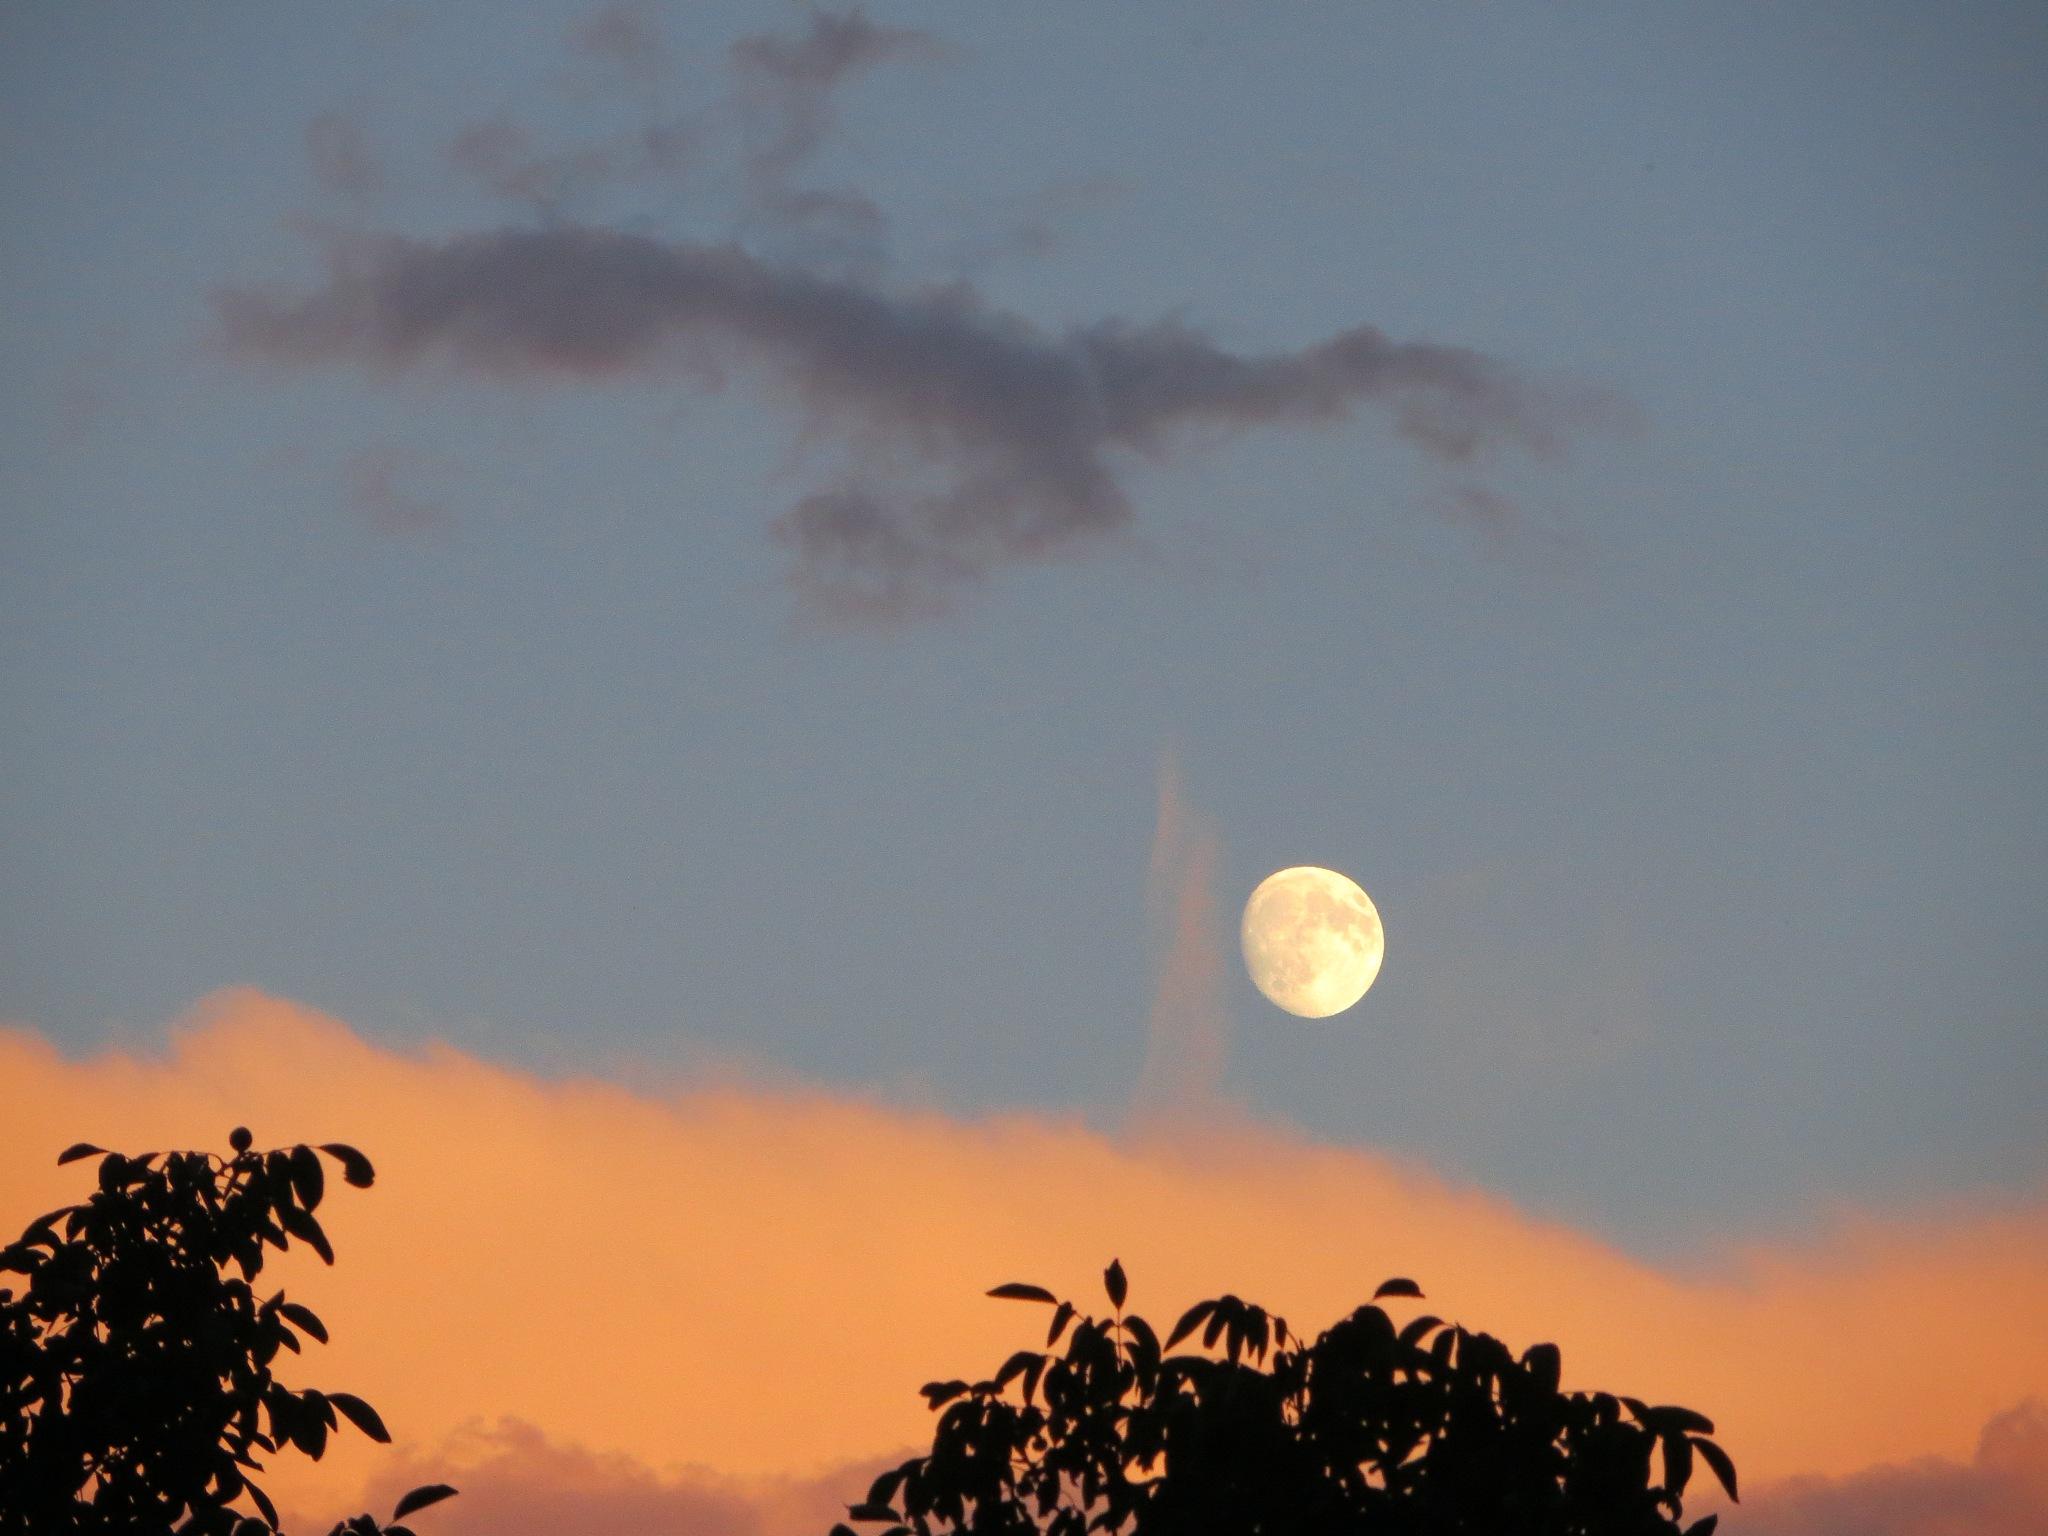 Cloud keep over the moon by kamelk